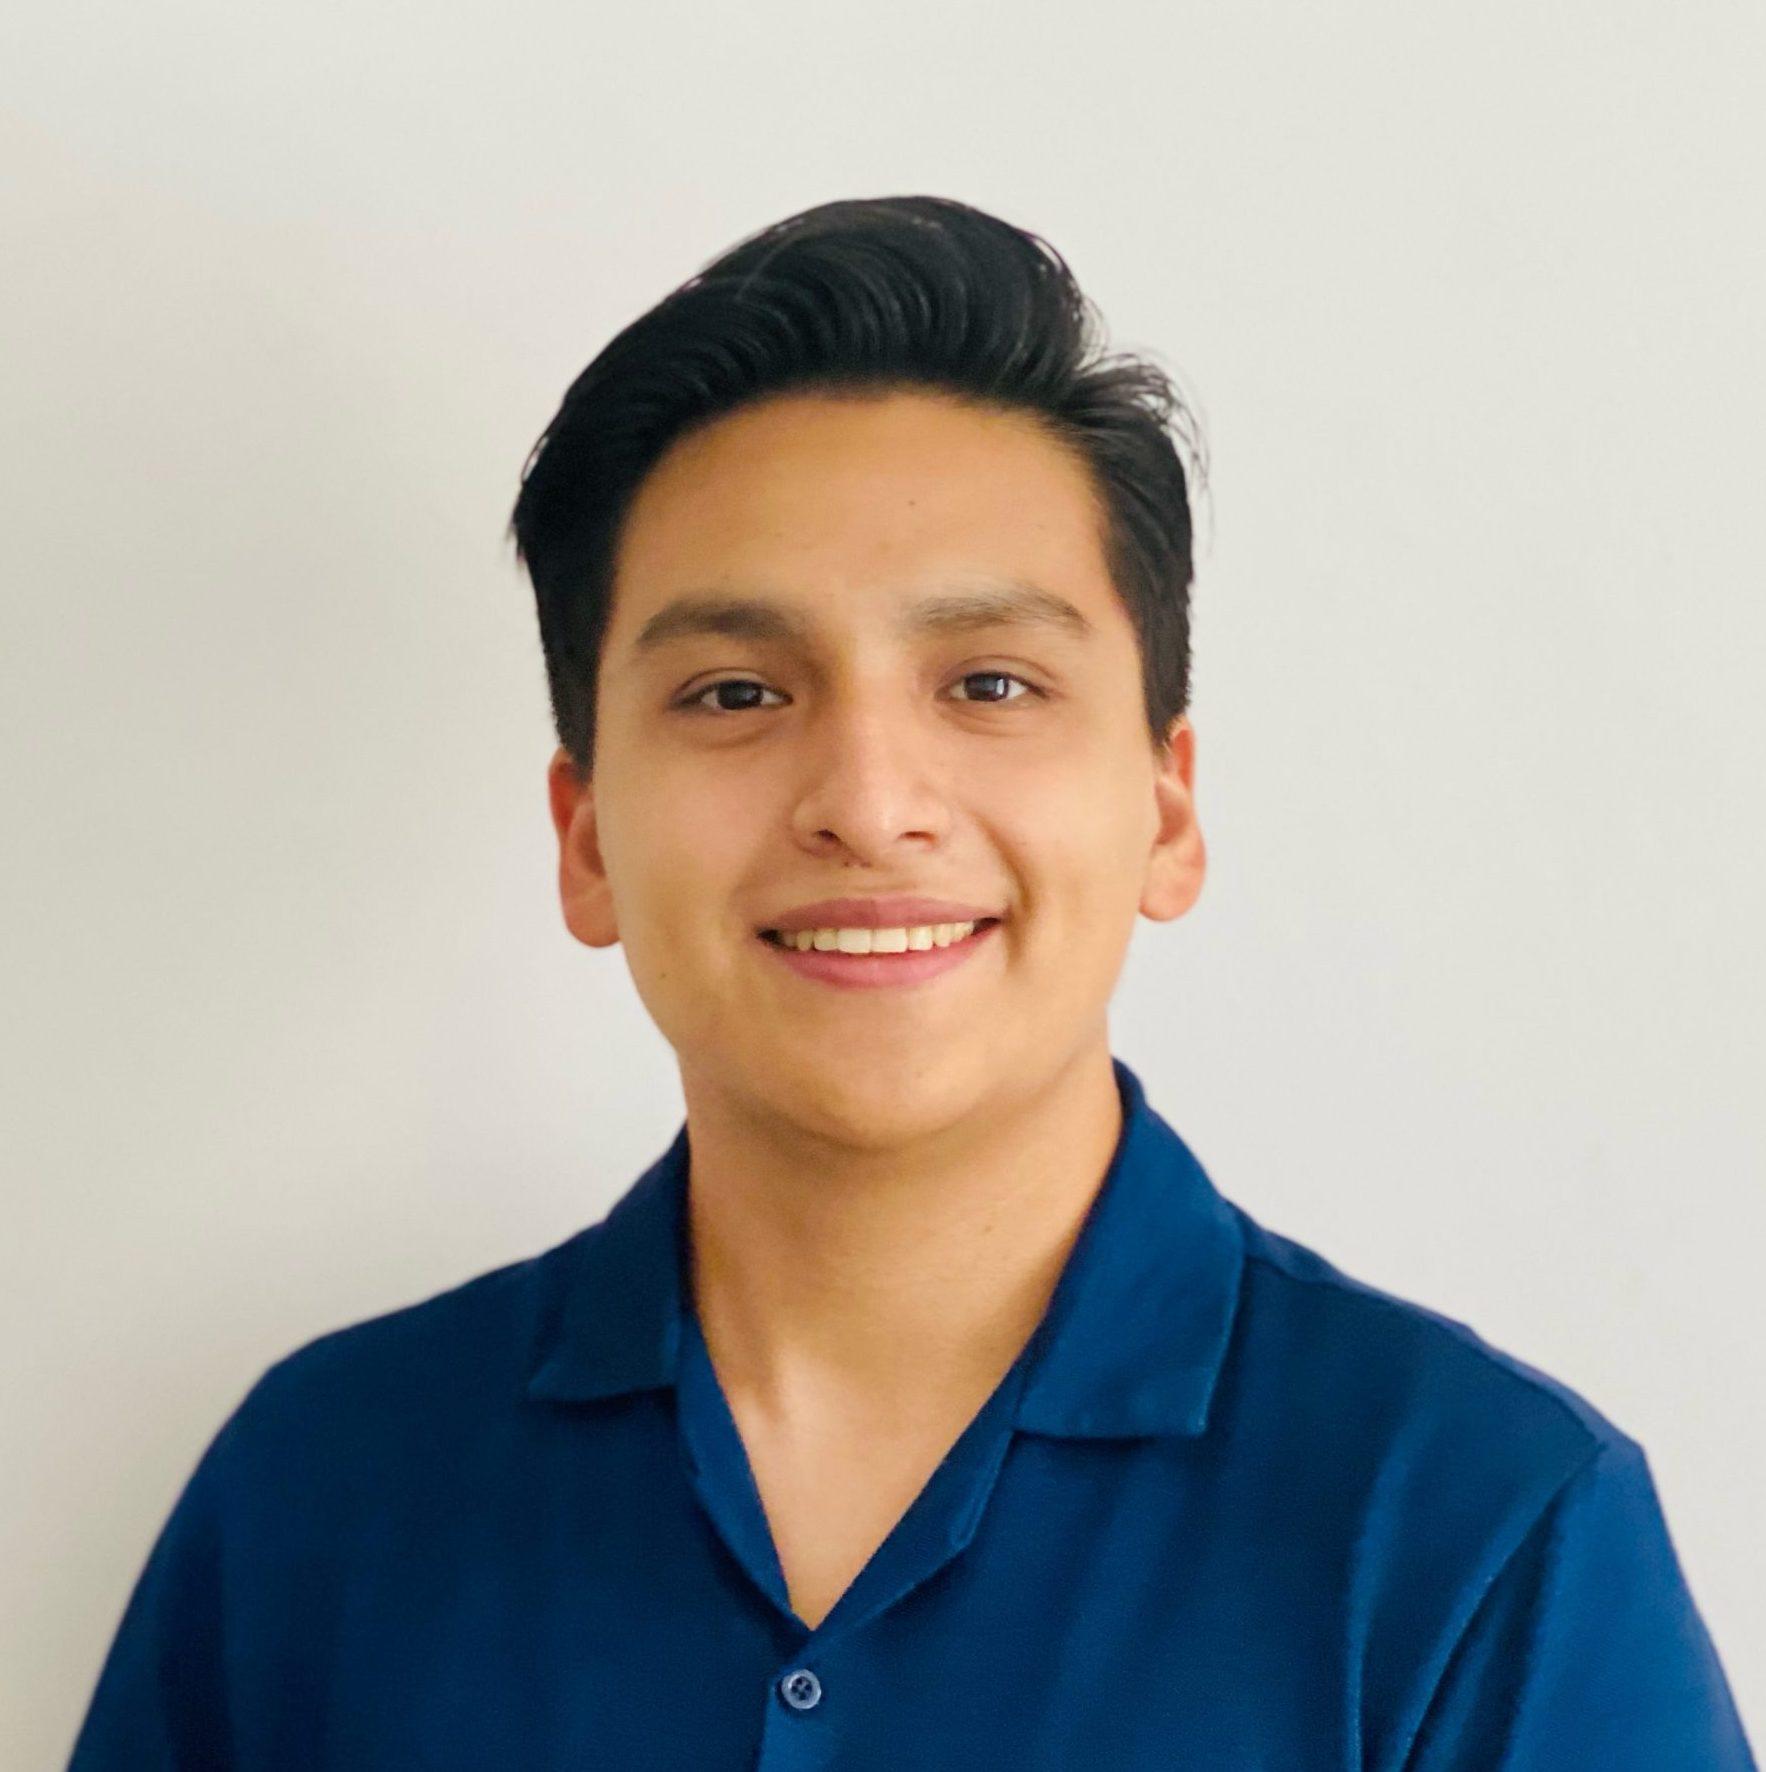 Uriel Pacheco, iOS Engineer